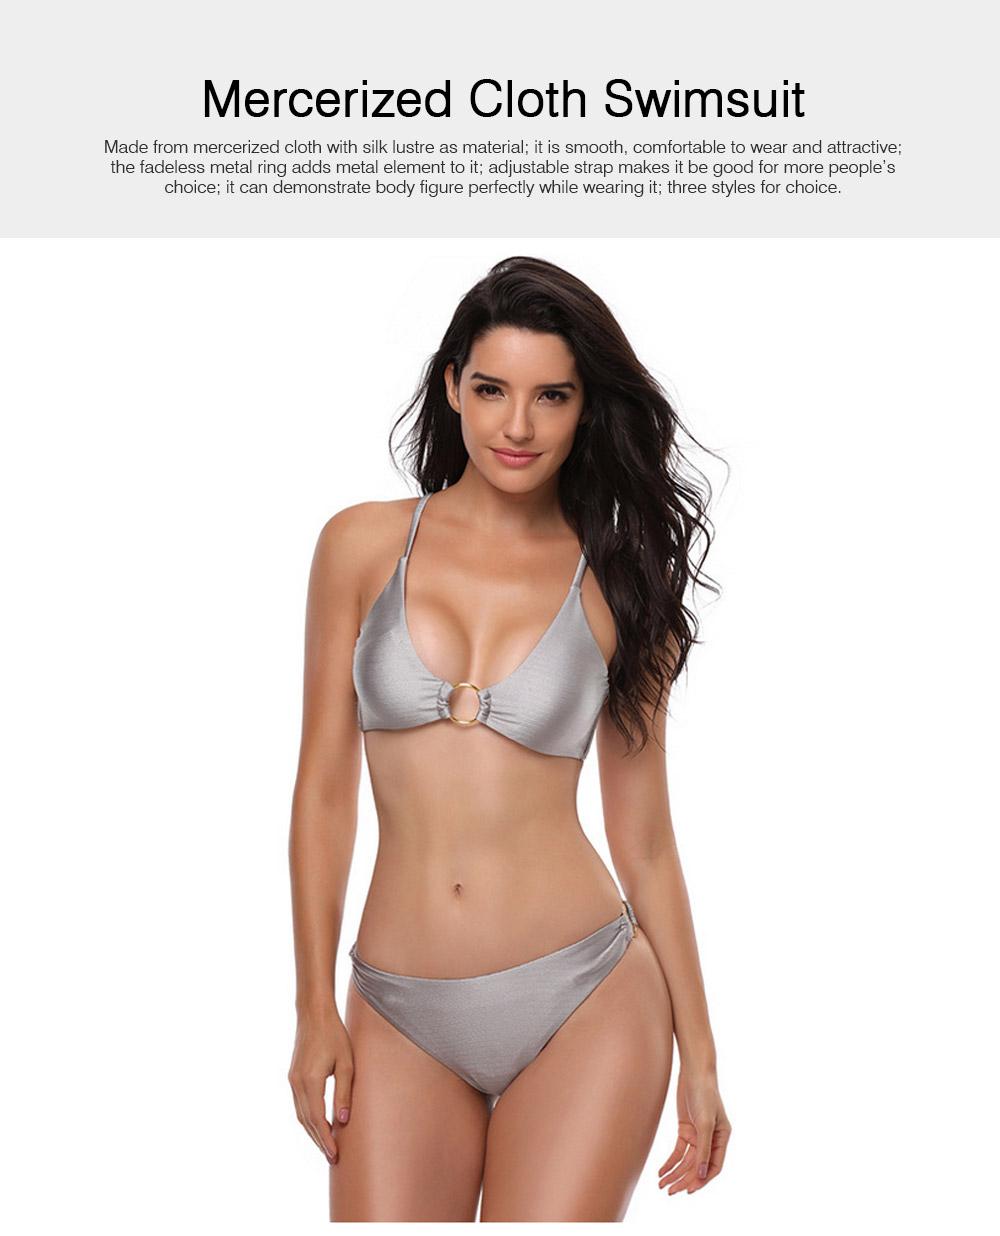 Mercerized Cloth Swimsuits for Women New Style Swimsuit Cover Ups Girls Bikini Swimwear 0